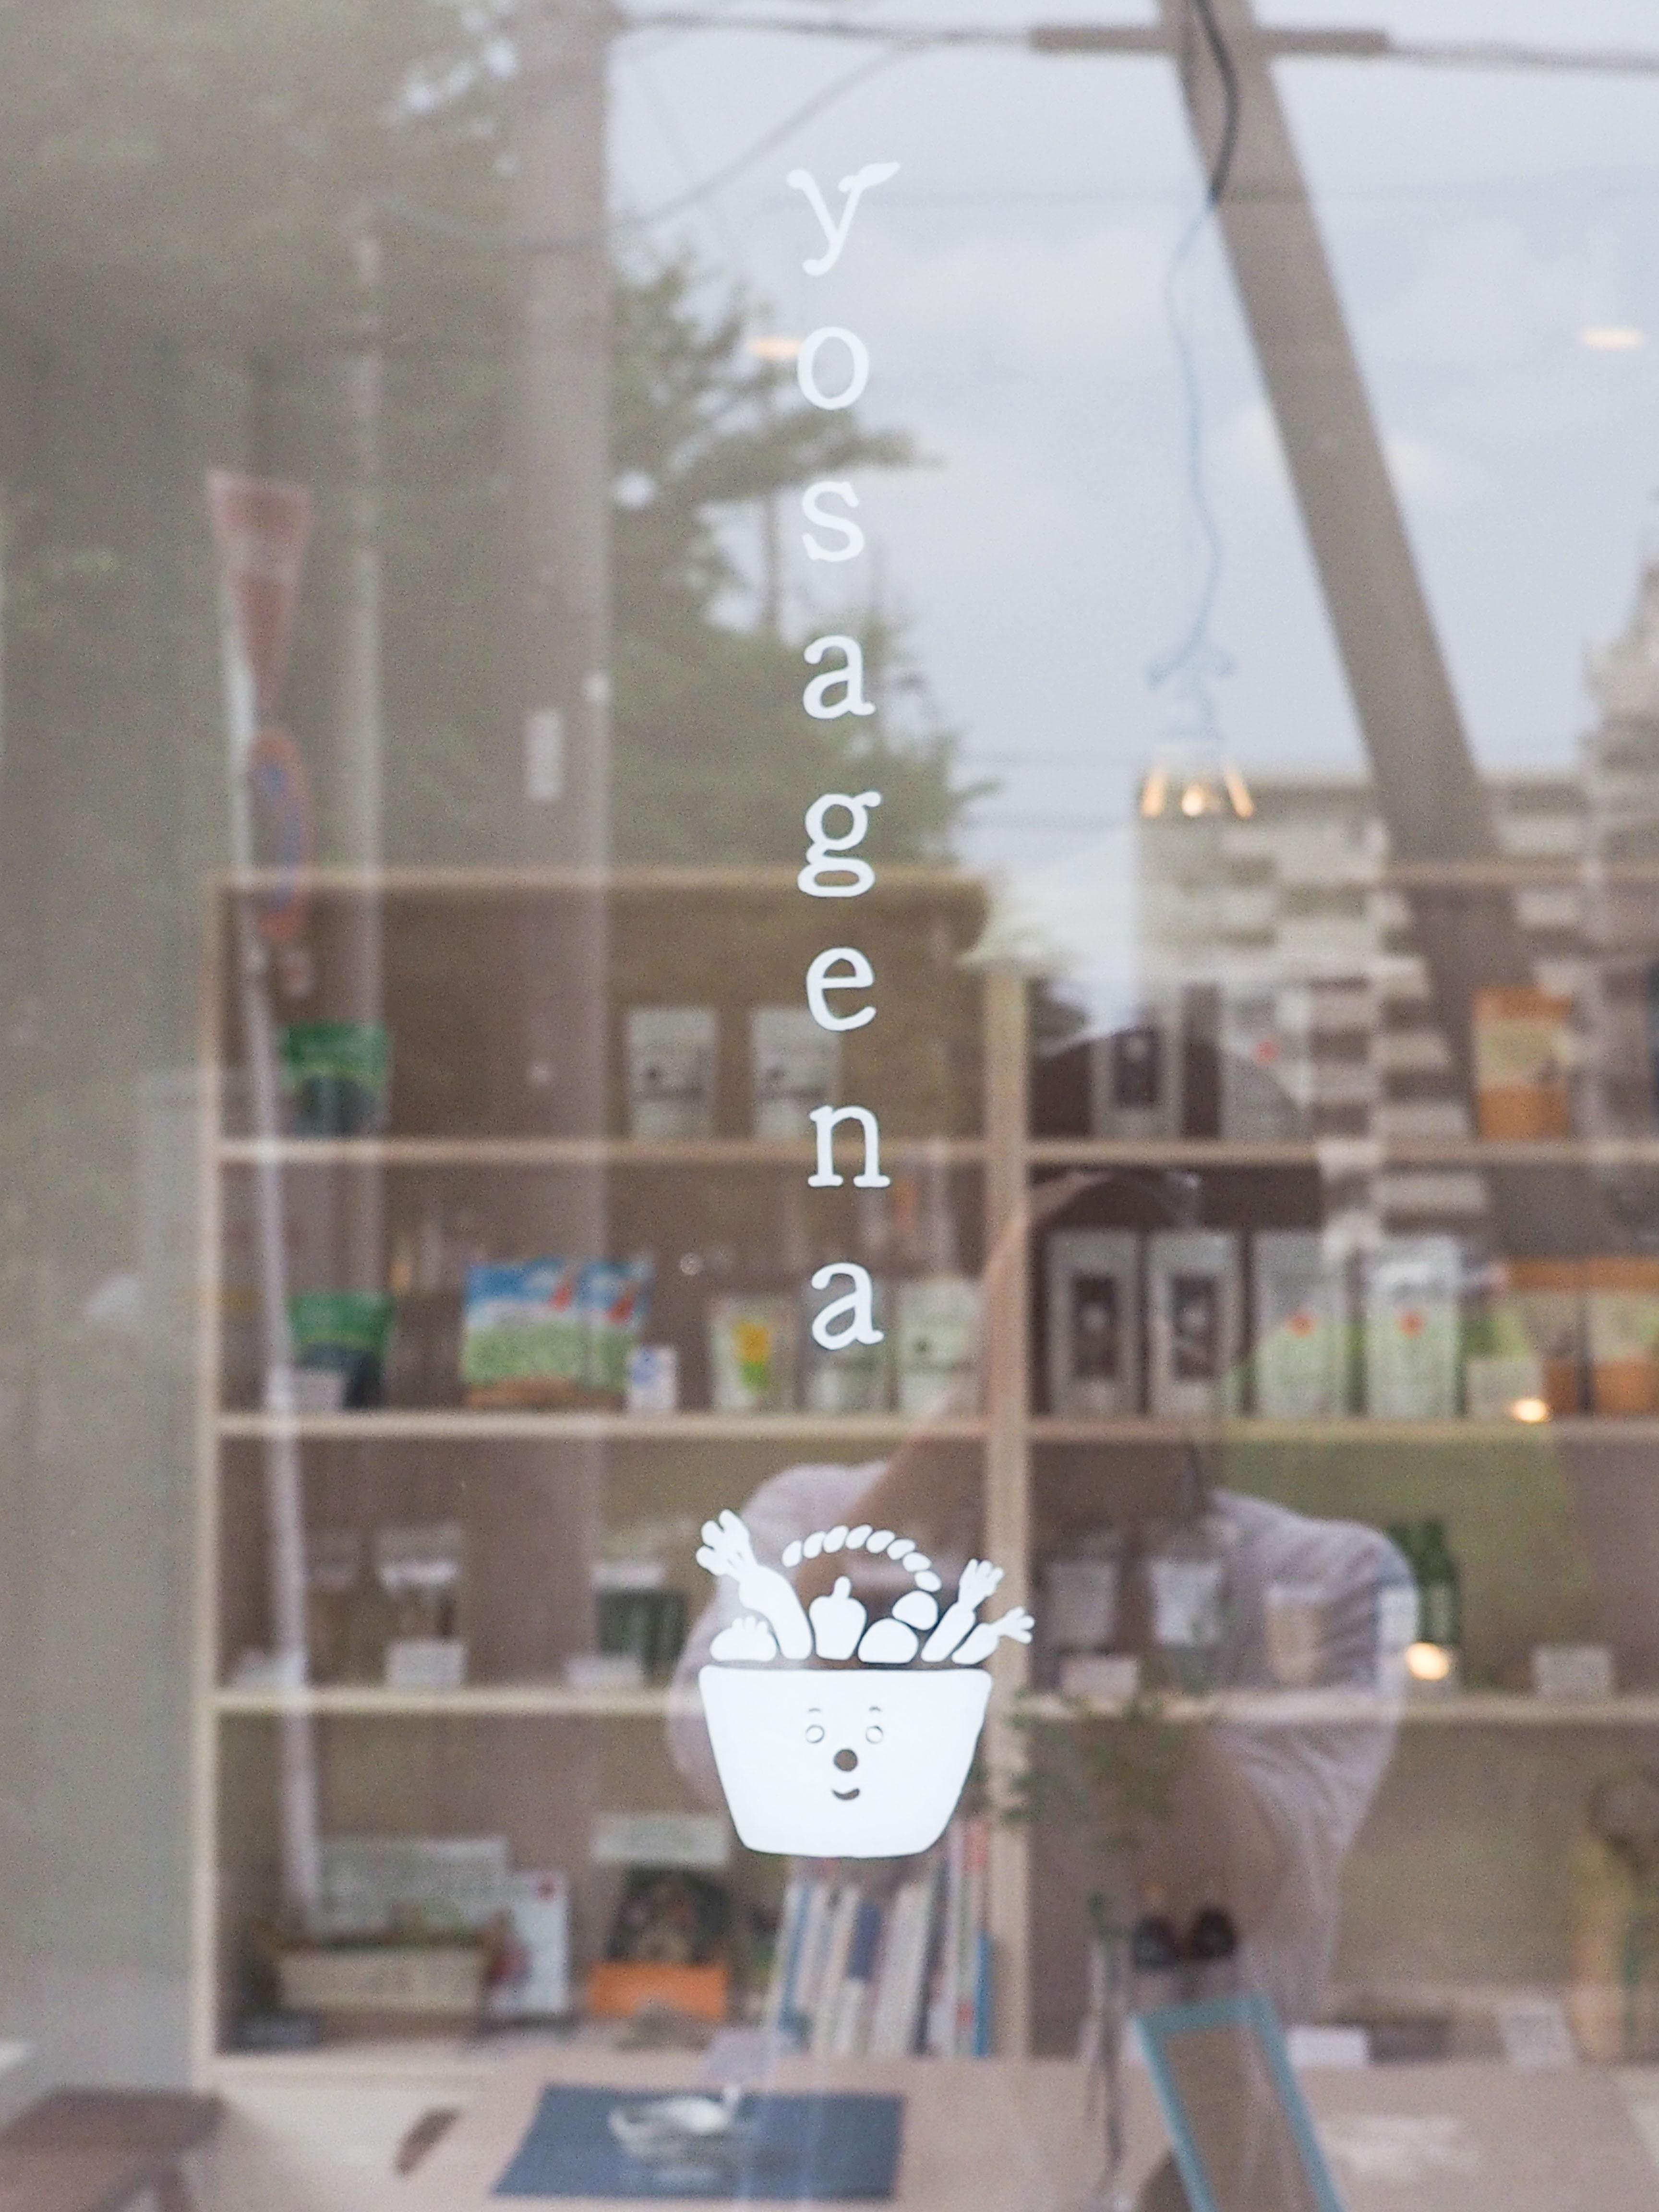 yosagena 窓サイン